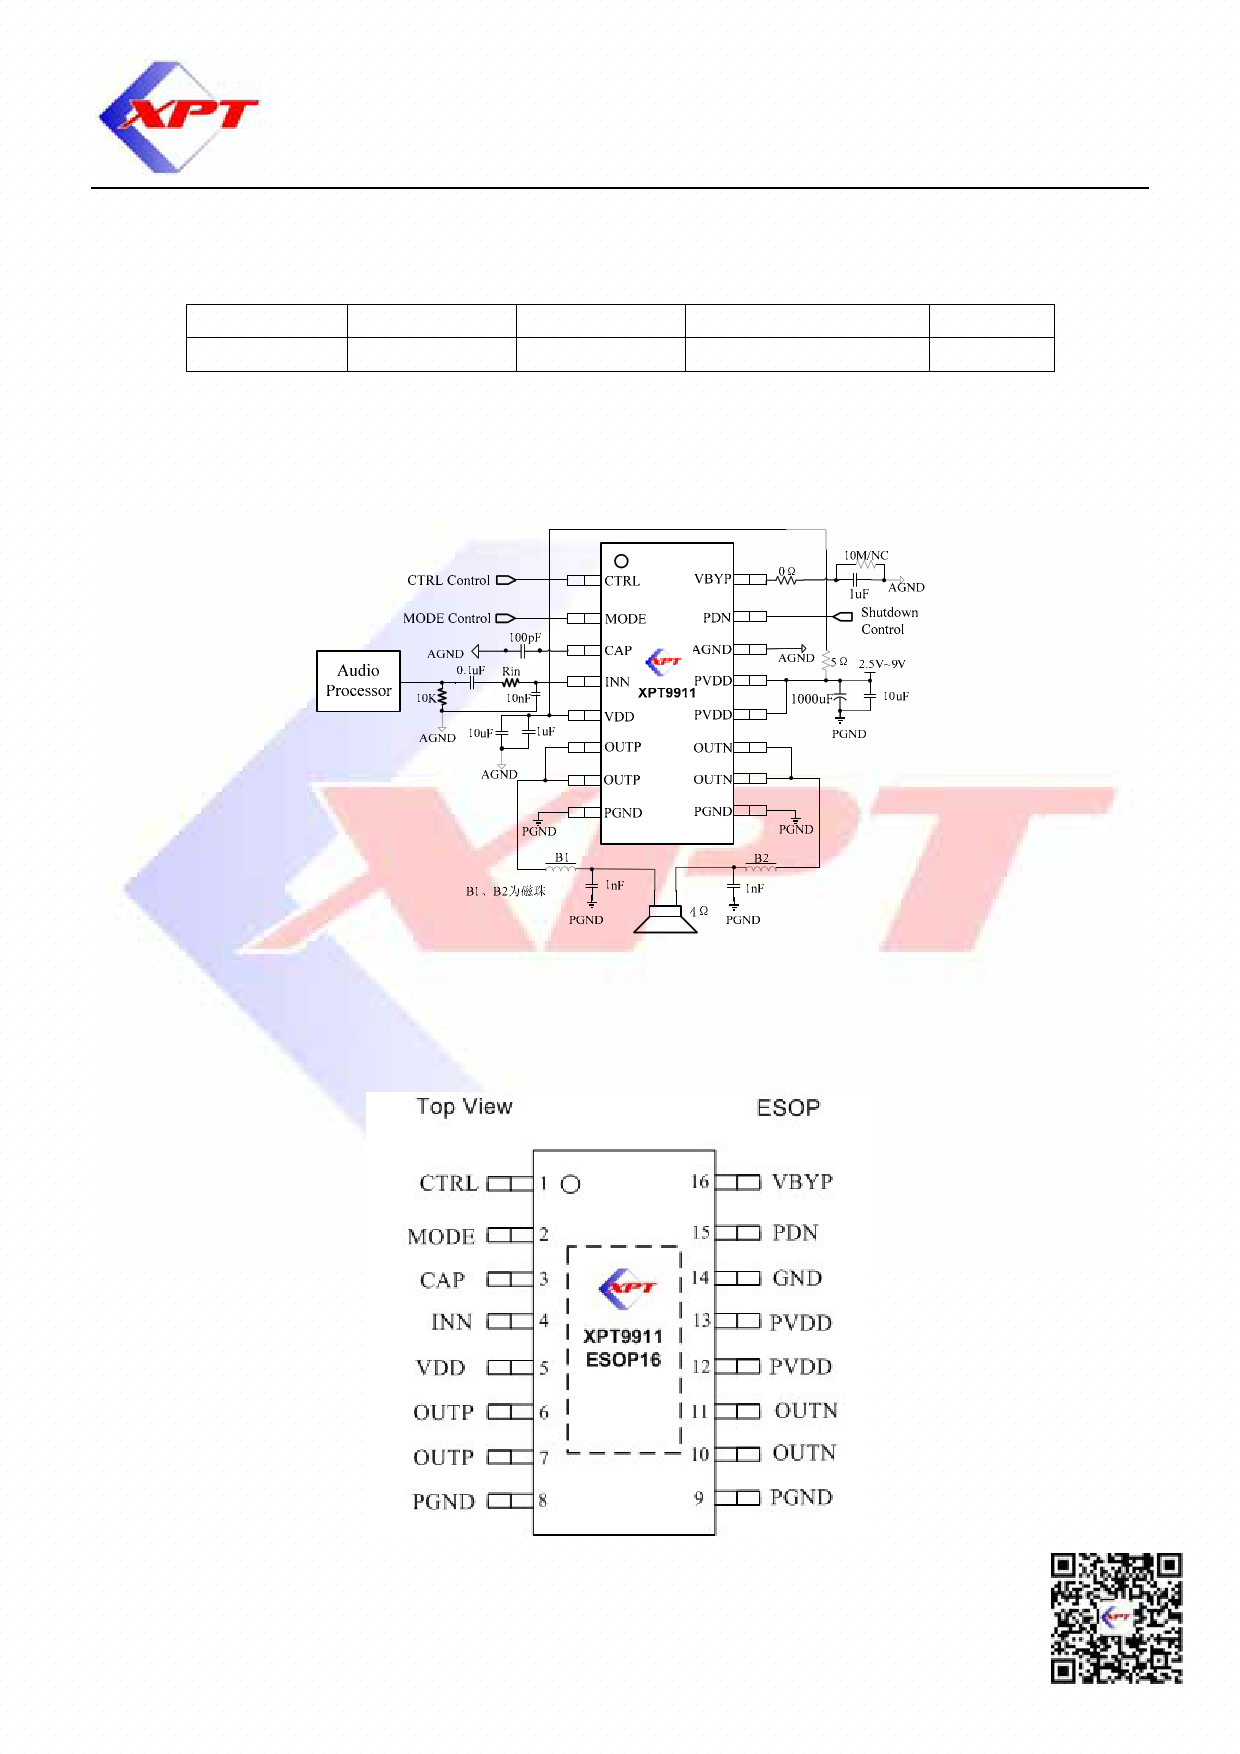 XPT9911 pdf, schematic